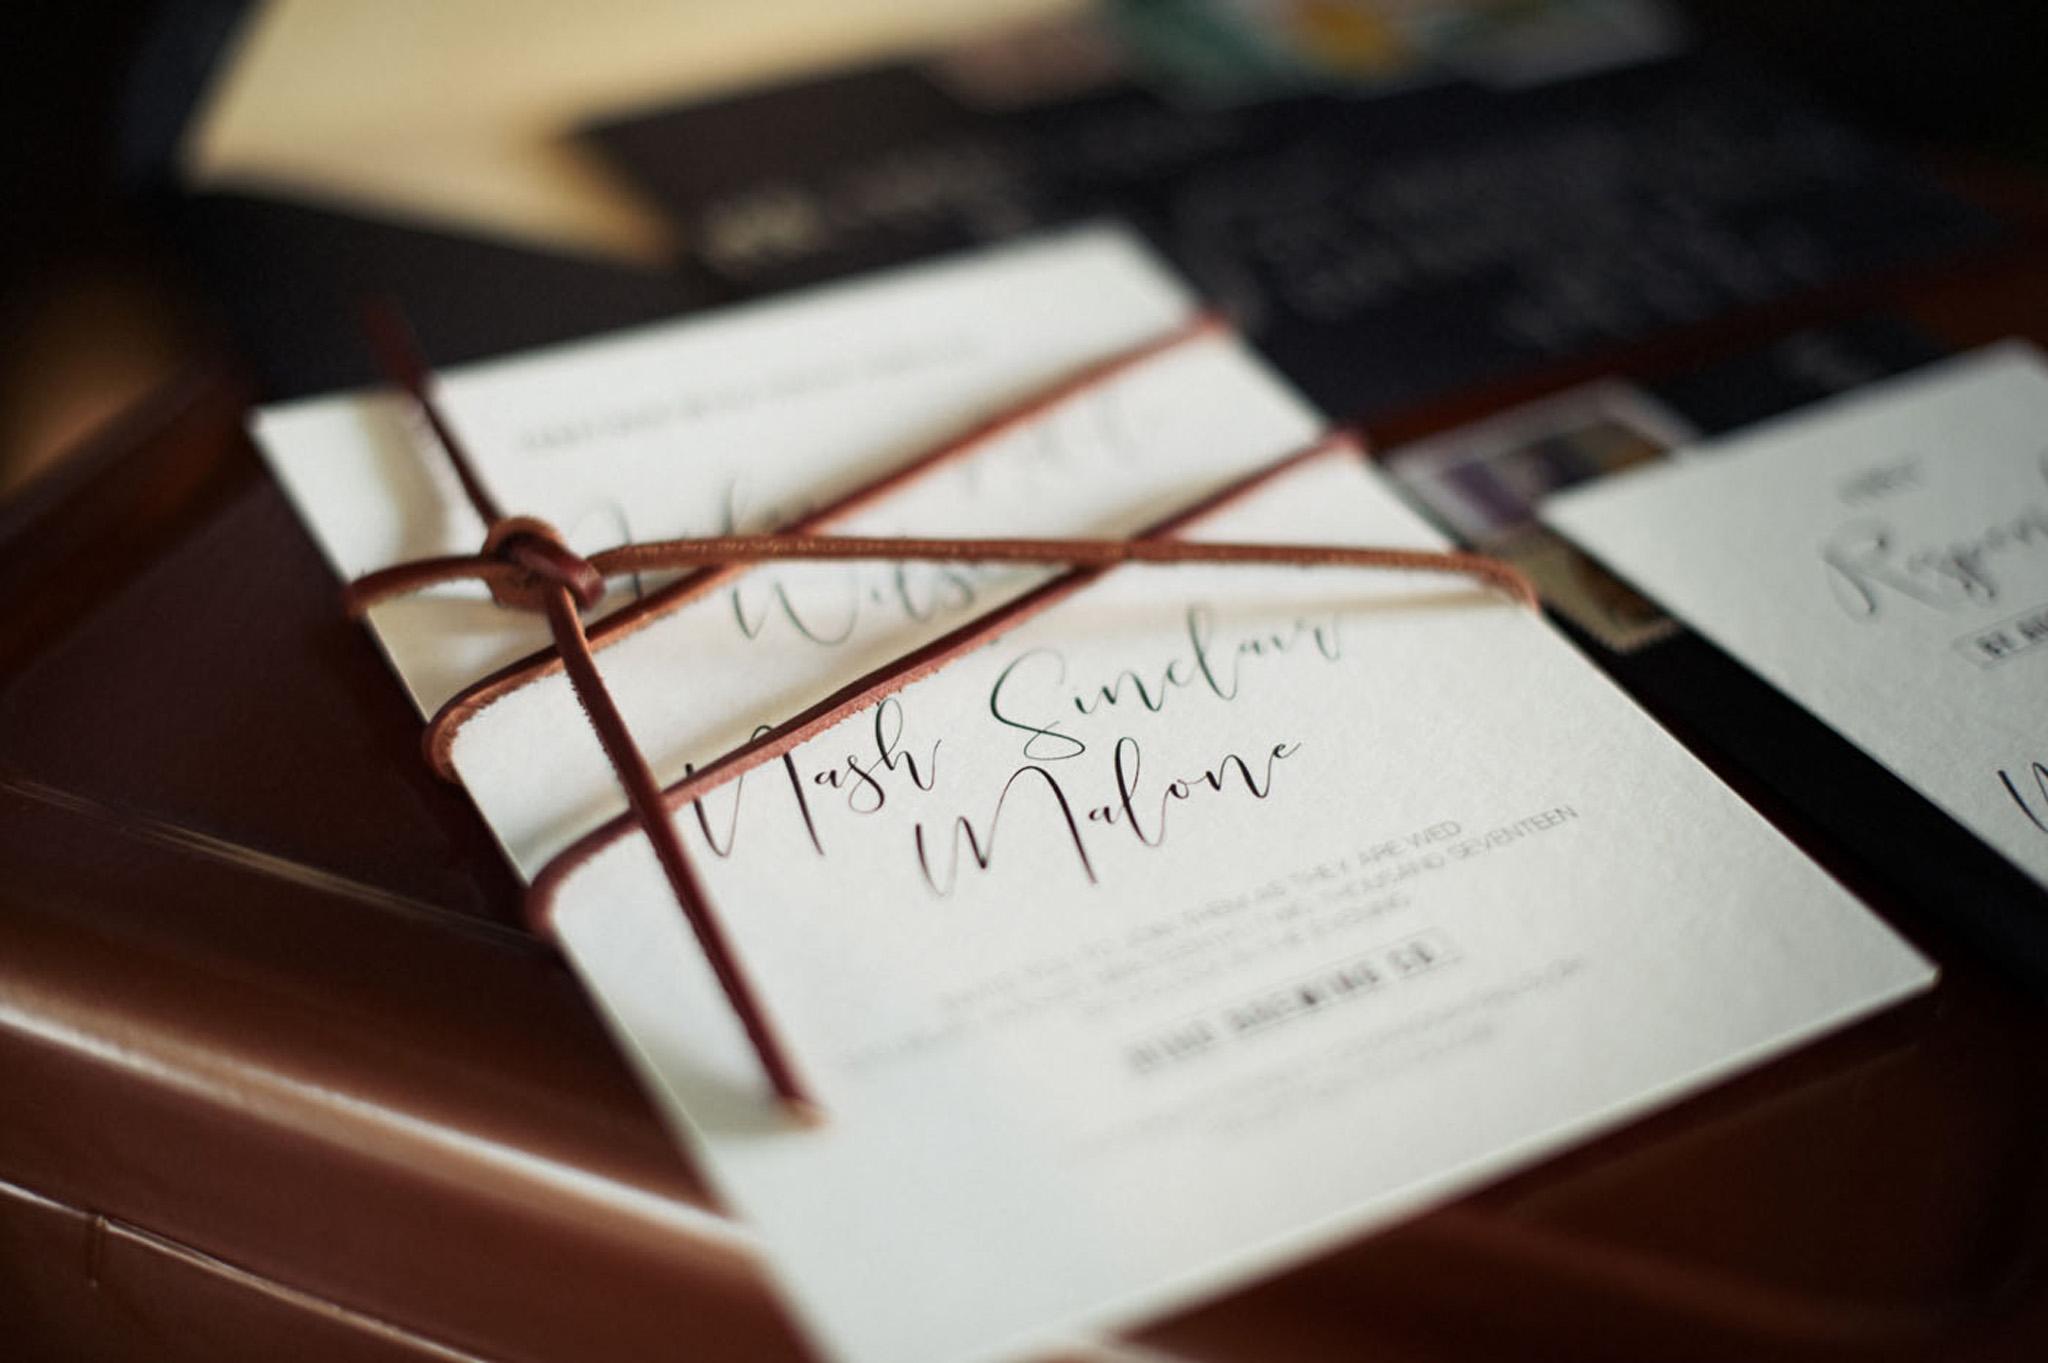 Timeless wedding invitations and coordinated details - Amanda Cursaro of Baci Designer- Founder of Handpicked | A Bridal Event -